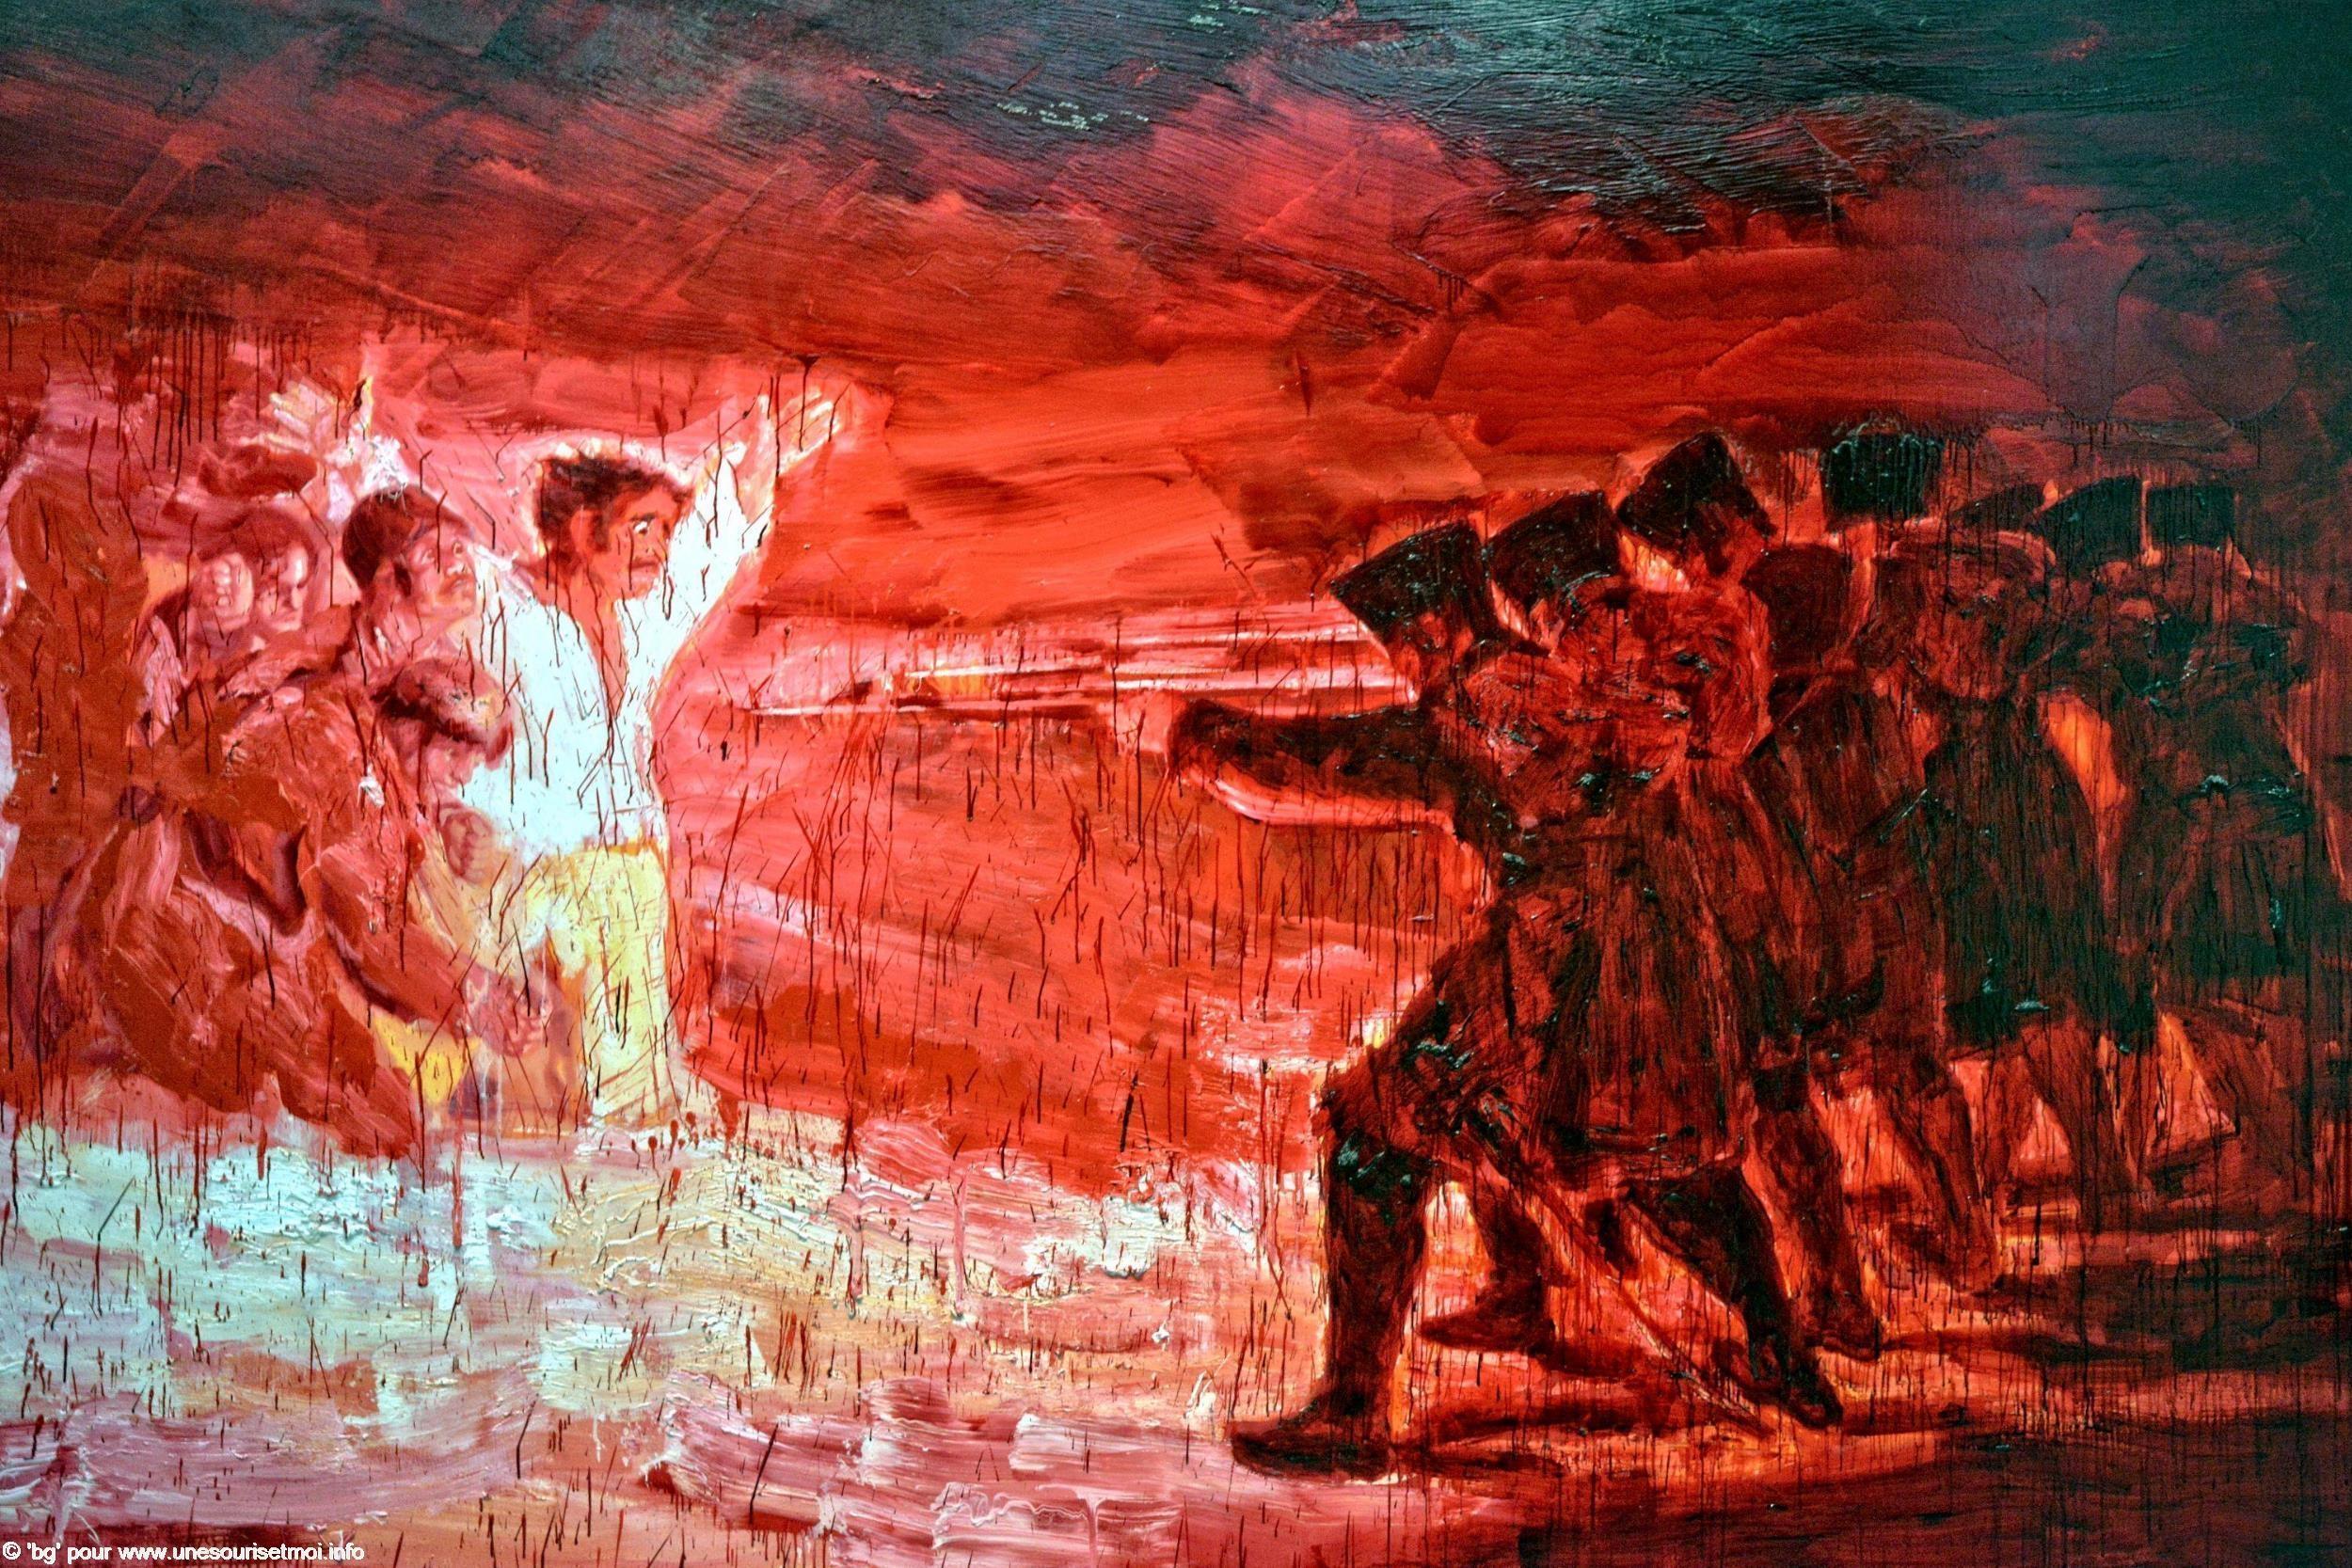 guerres-napoleoniennes-execution-dapres-goya-yan-pei-ming-2006-huile-sur-toile